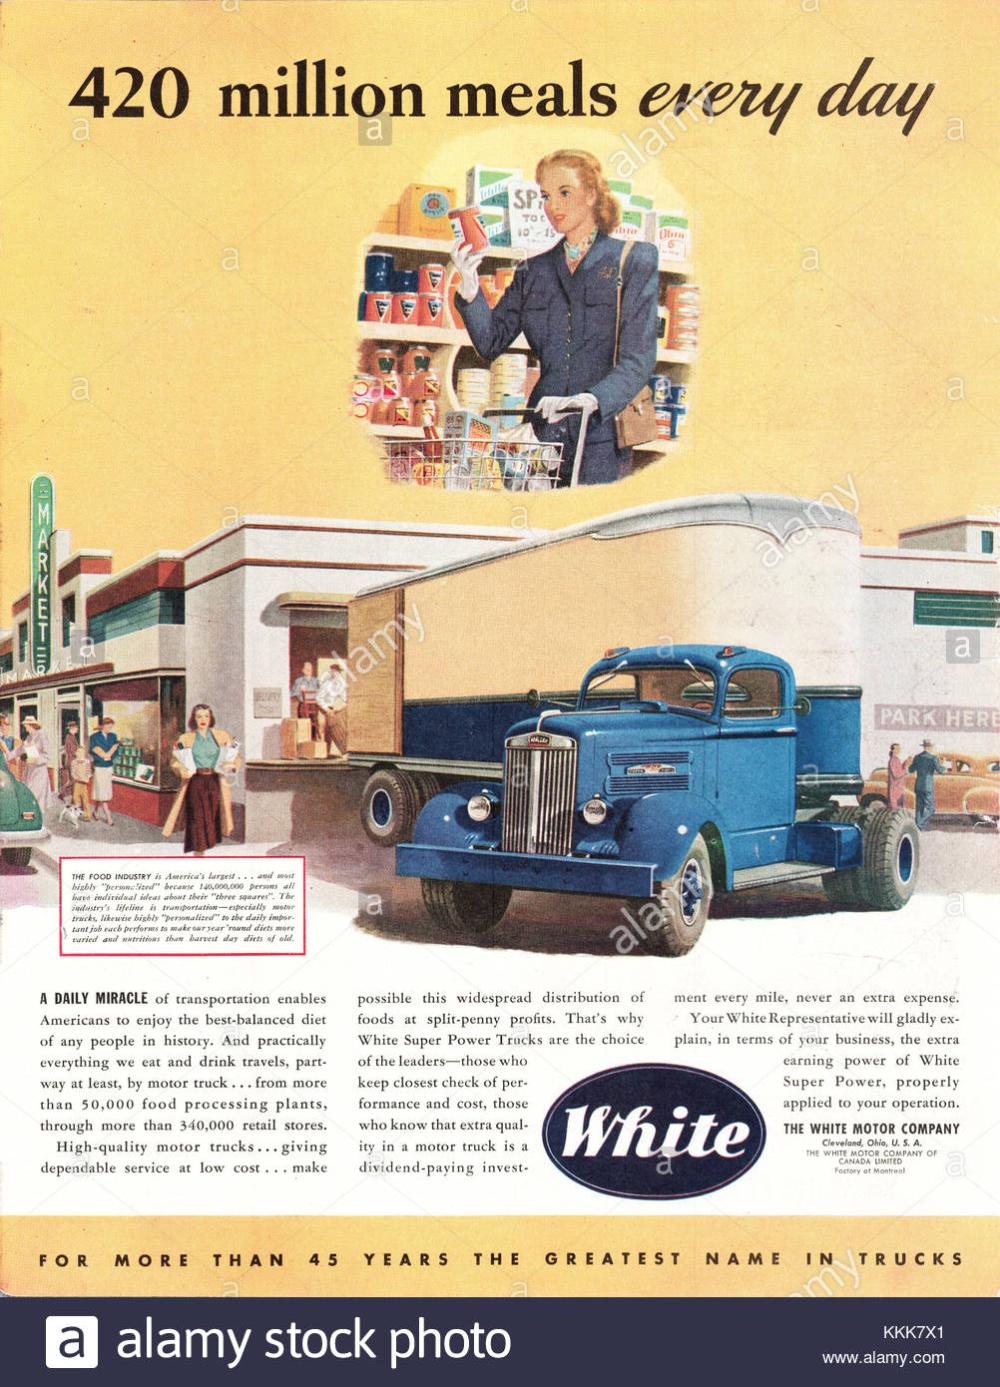 Pin On White Motor Company